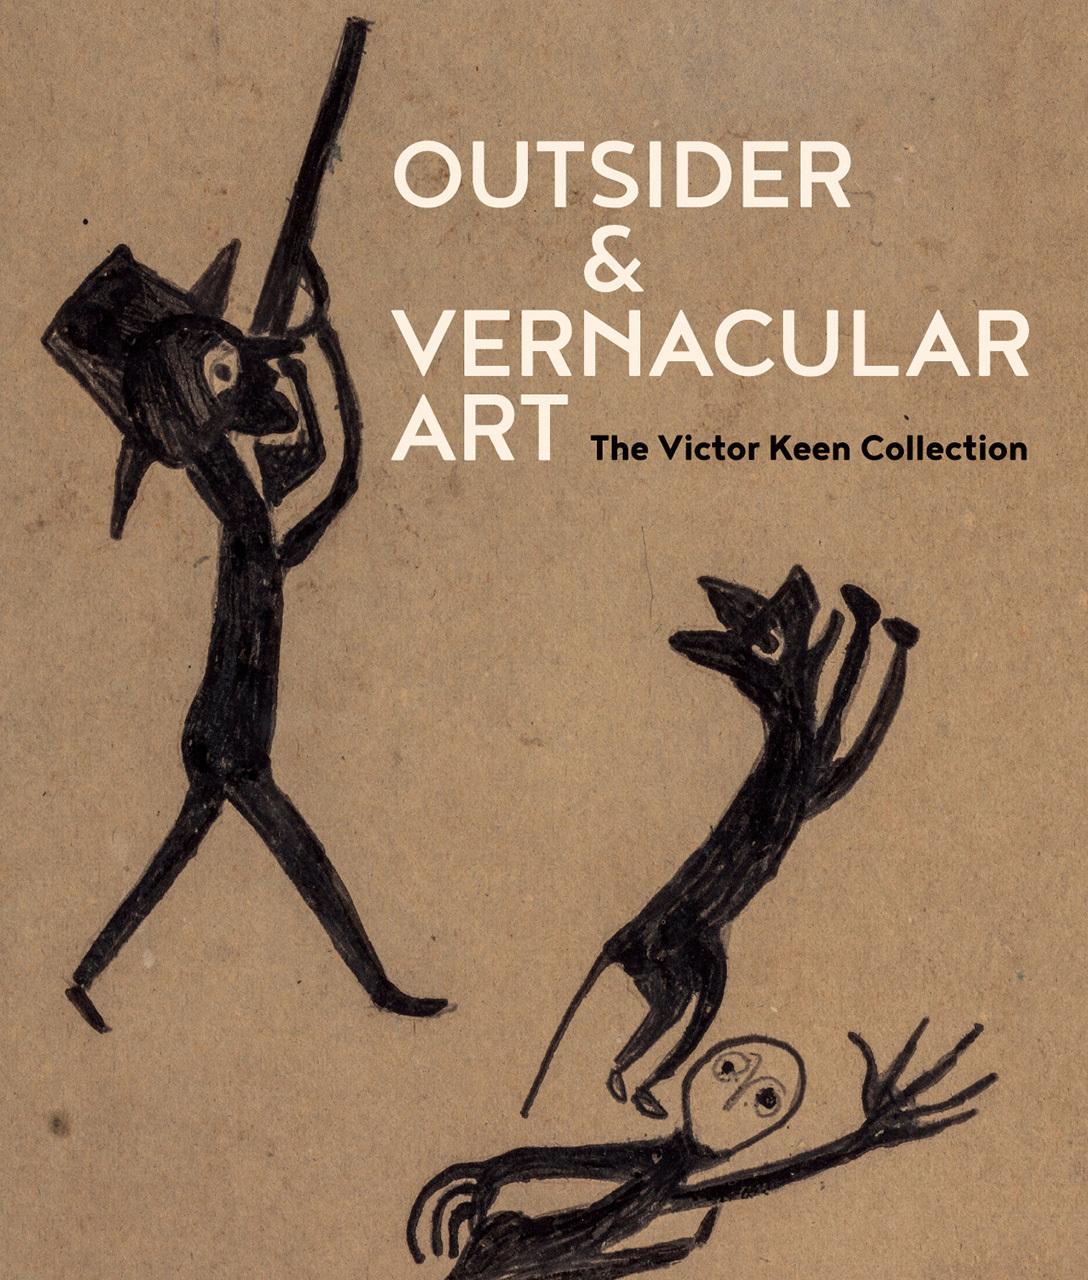 OUTSIDER & VERNACULAR ART THE VICTOR KEEN COLLECTION /ANGLAIS